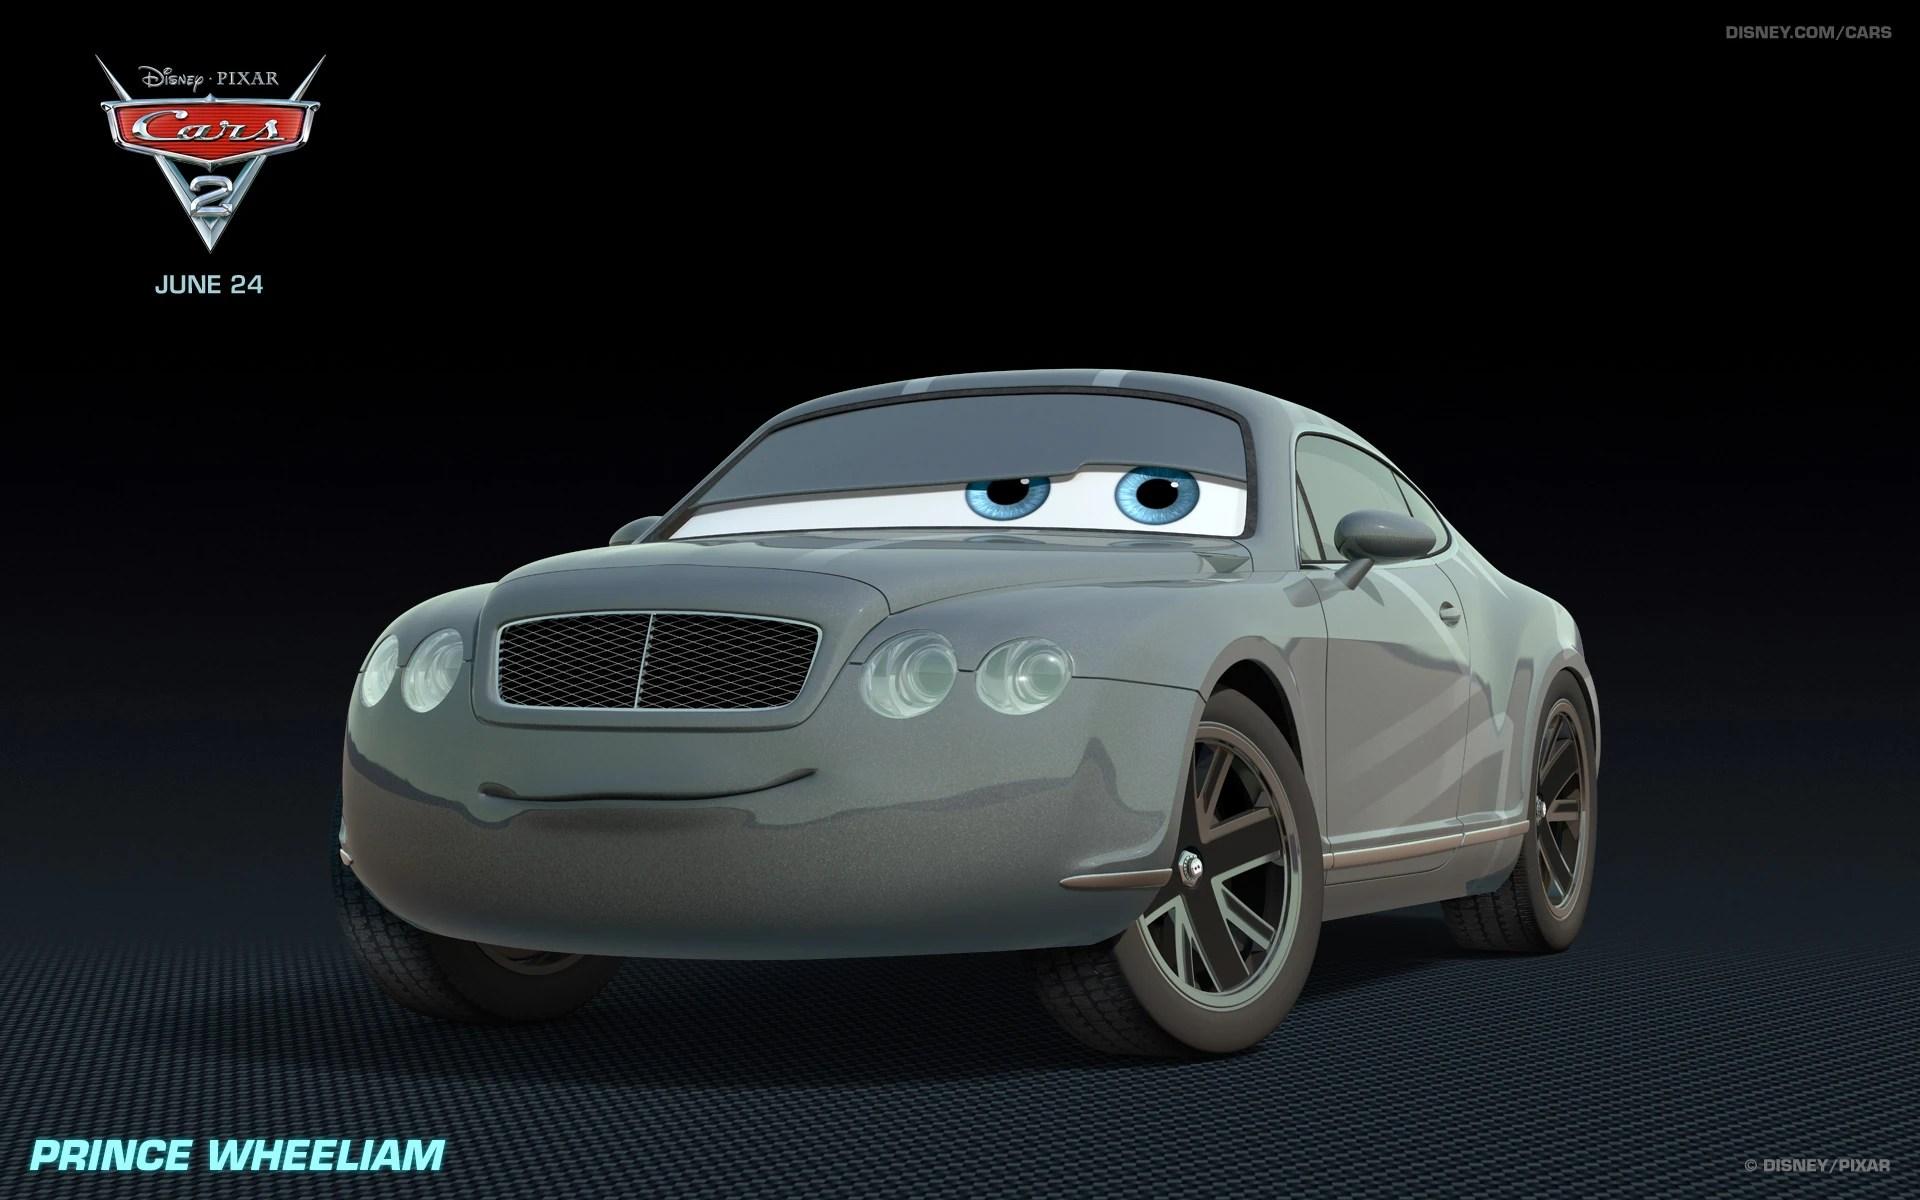 Disney Pixar Cars World Wallpaper Mural Prince Wheeliam Pixar Wiki Fandom Powered By Wikia